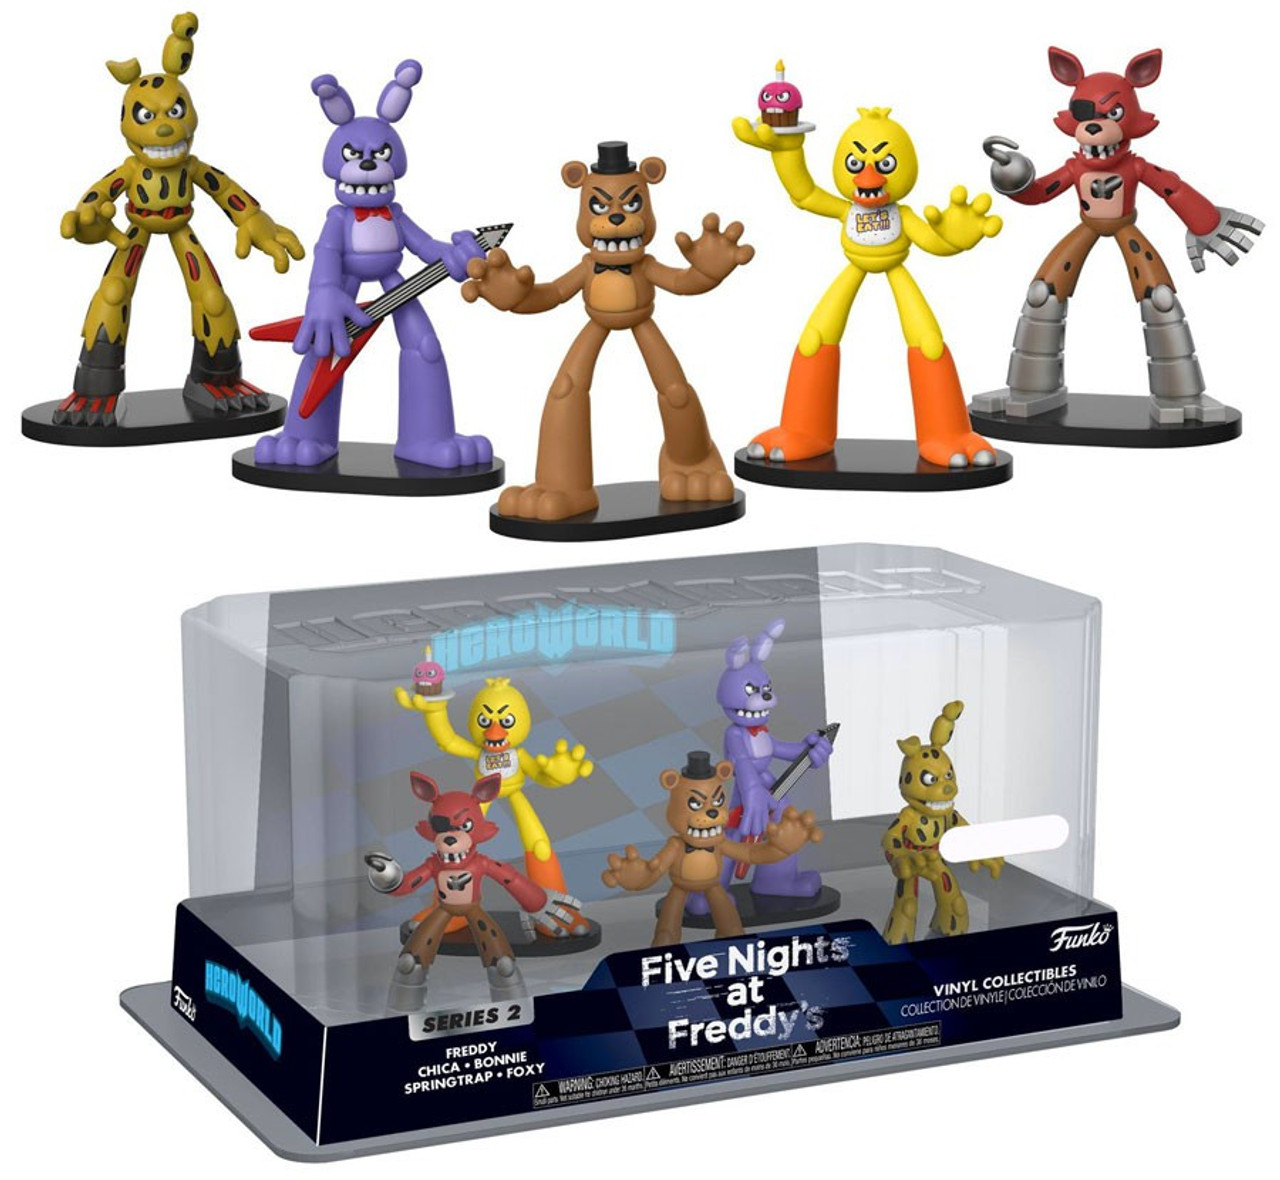 Five Nights At Freddy's Bonnie Animated funko five nights at freddys hero world series 2 freddy